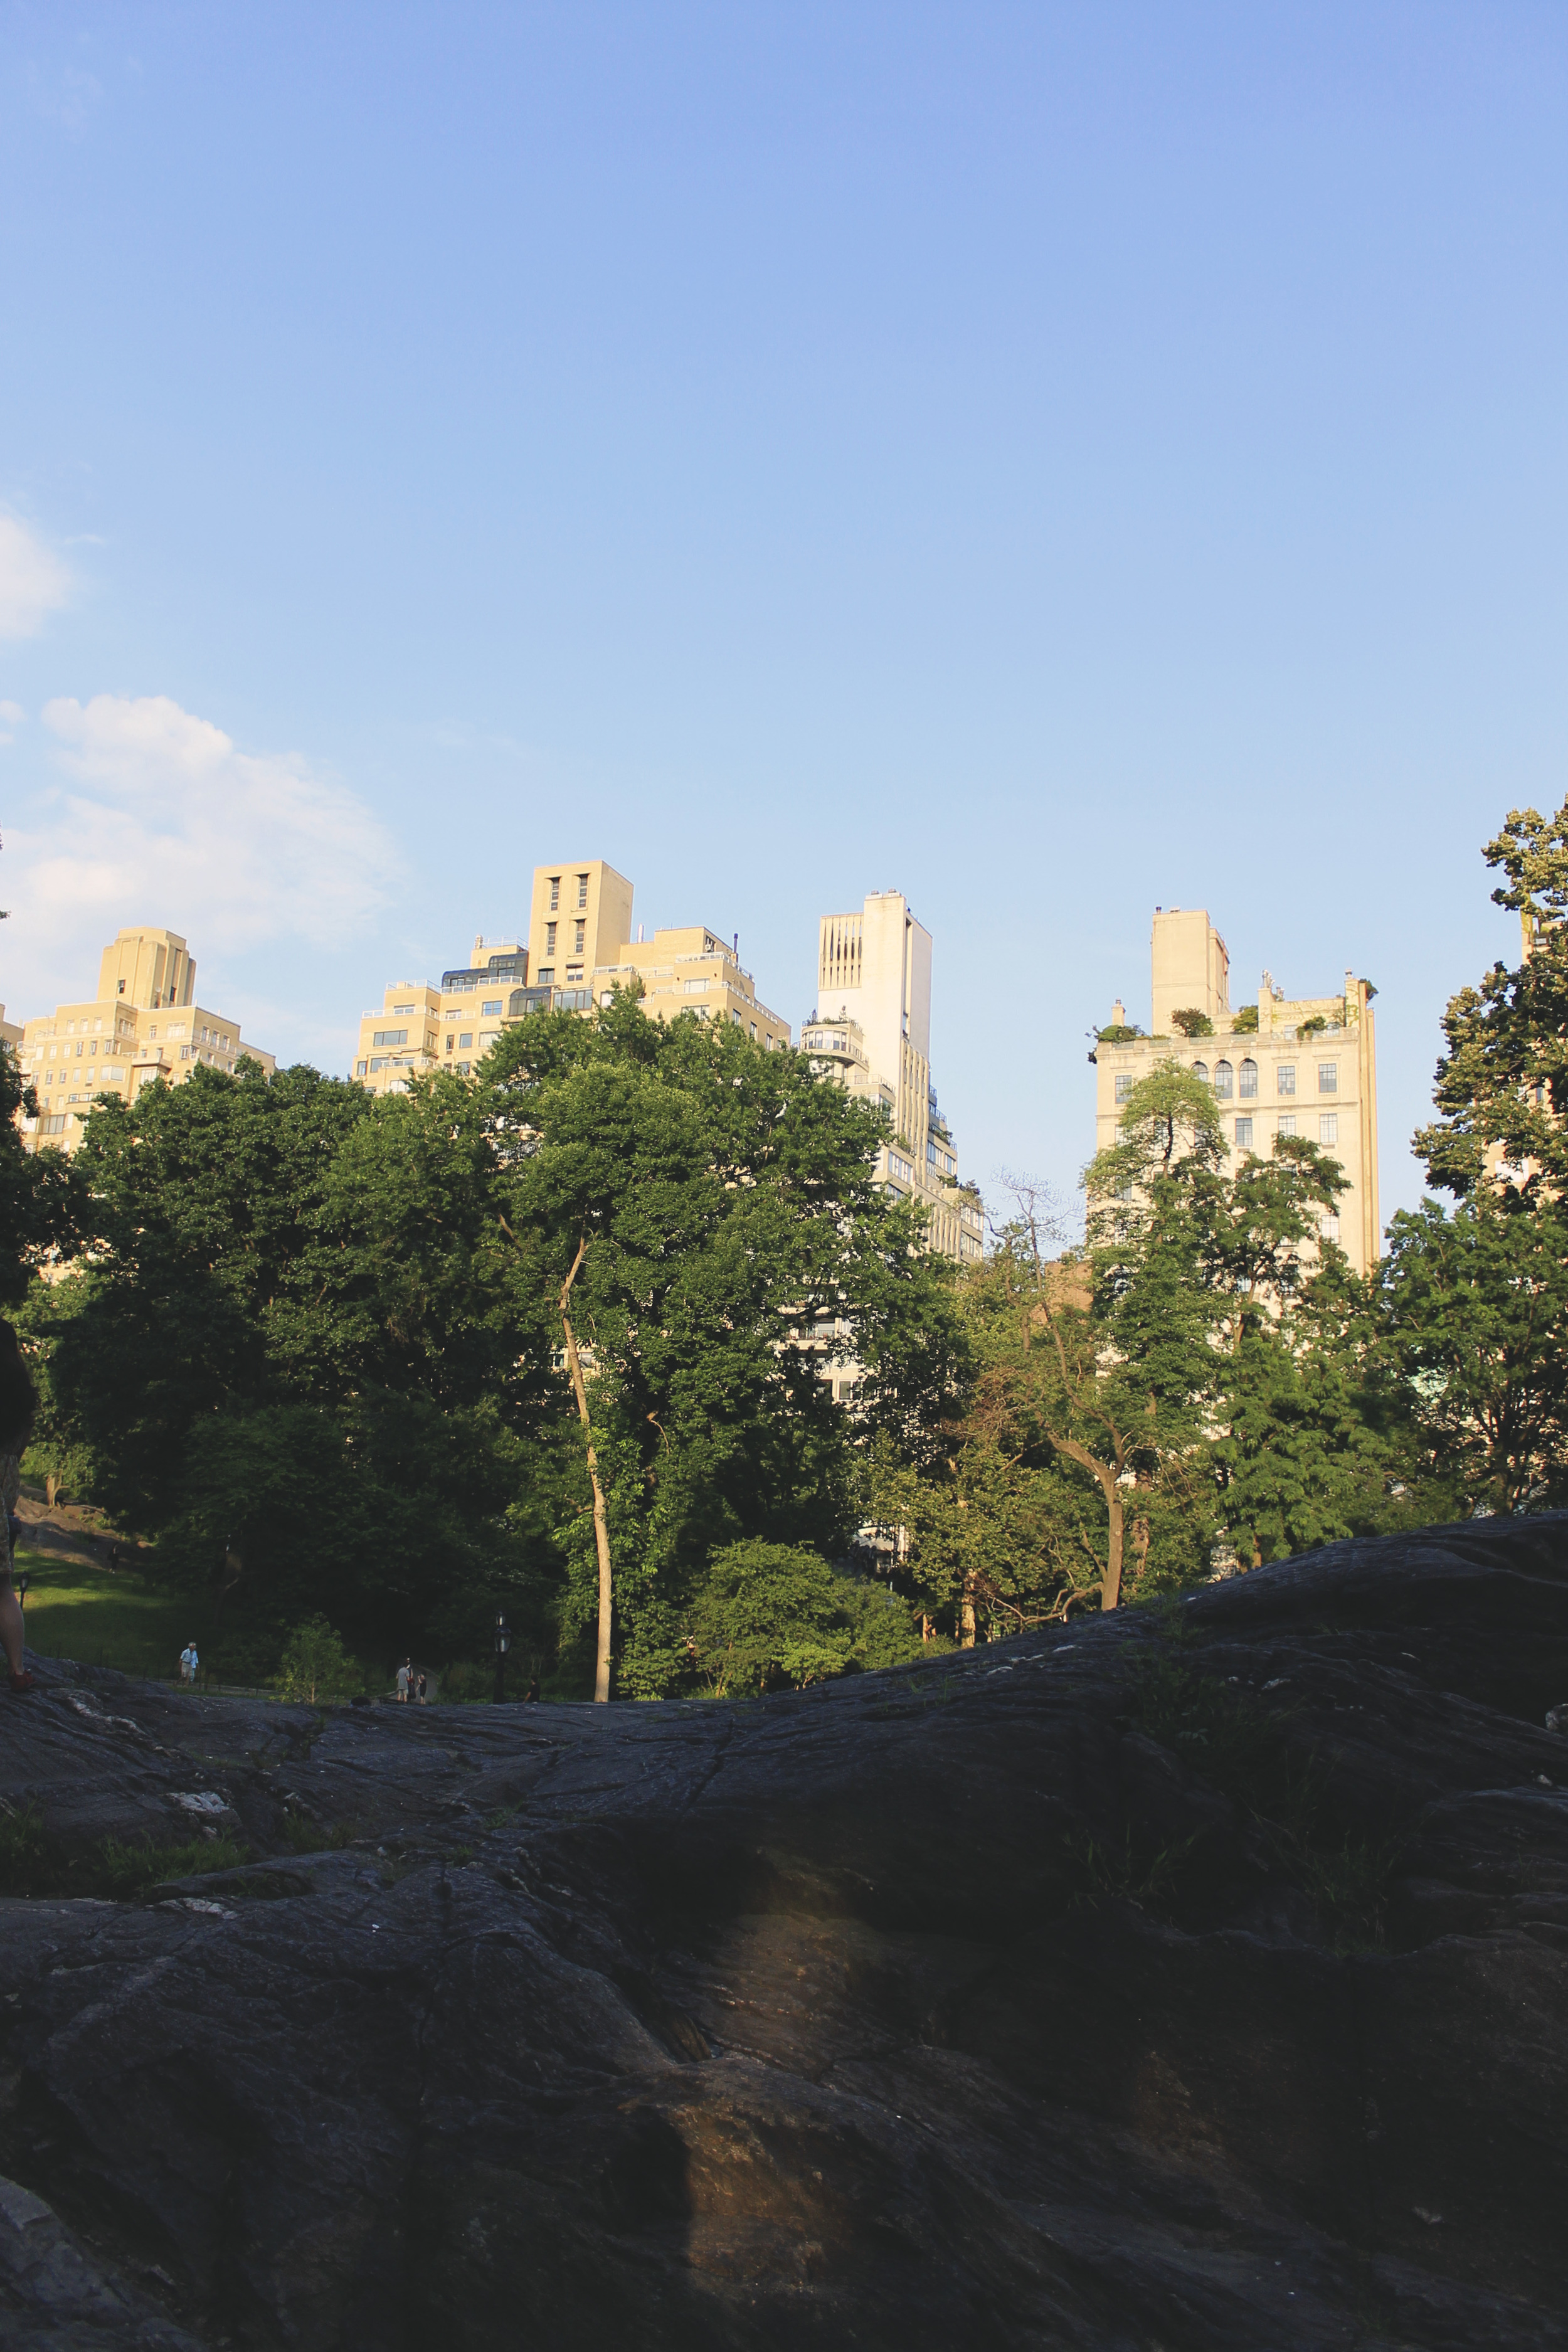 central park new york city upper east side